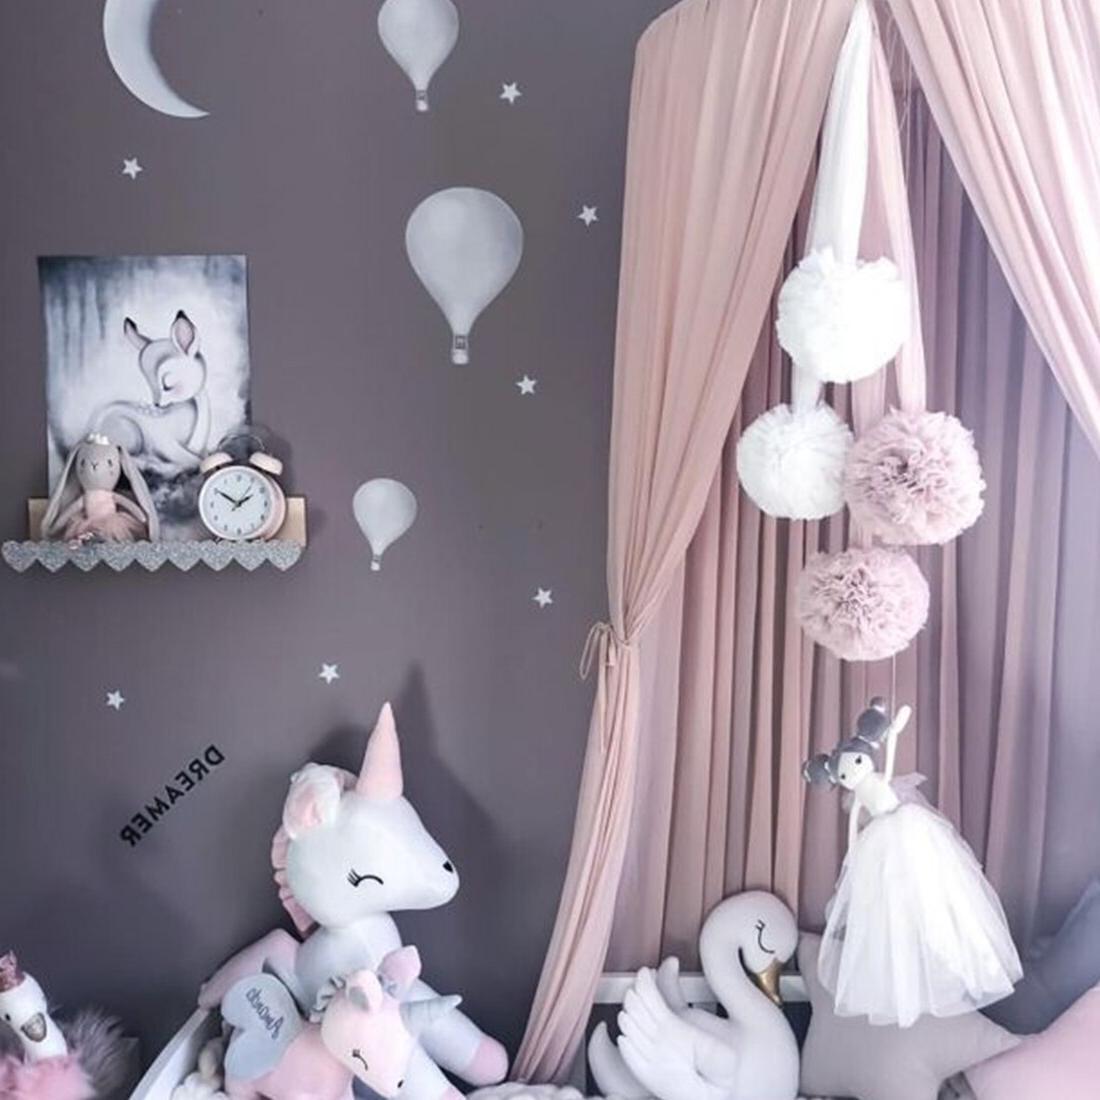 4 Colors Girls Princess <font><b>Canopy</b></font> Valance Decoration Baby <font><b>Bed</b></font> Net <font><b>Bed</b></font> <font><b>Canopy</b></font>